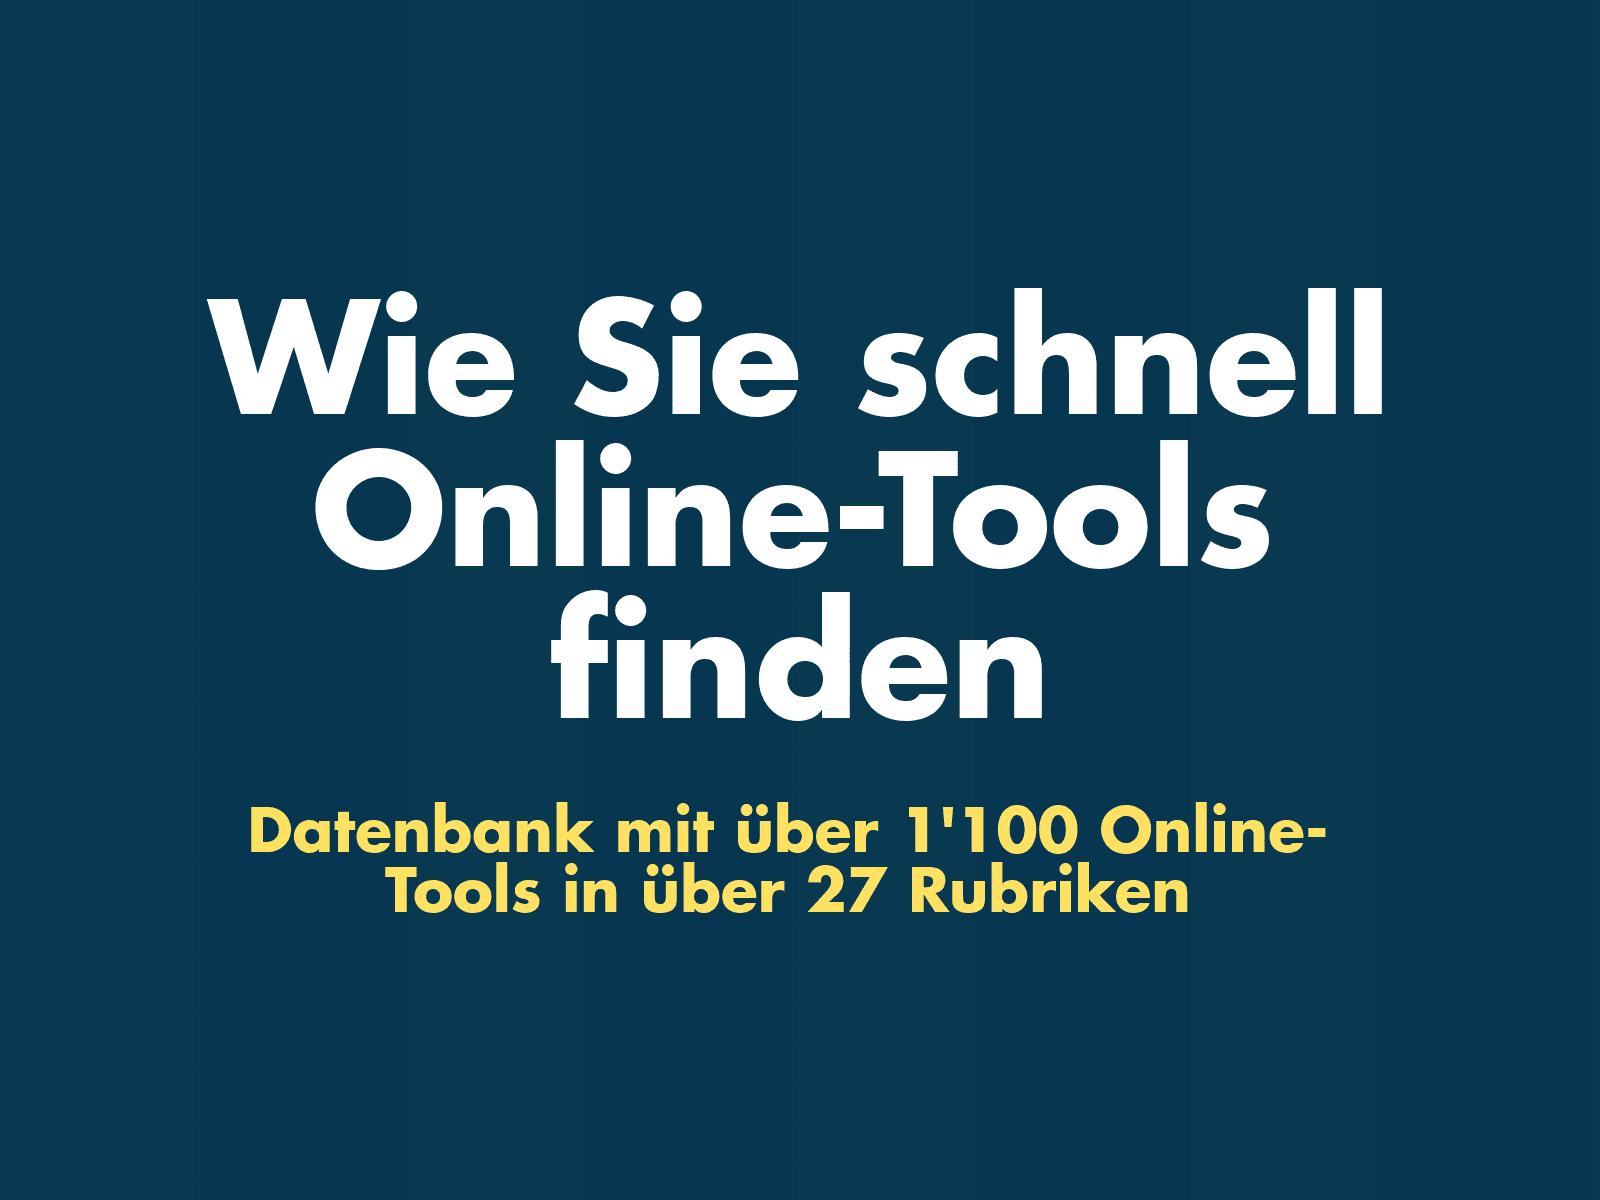 News - Central: Online-Tools Datenbank